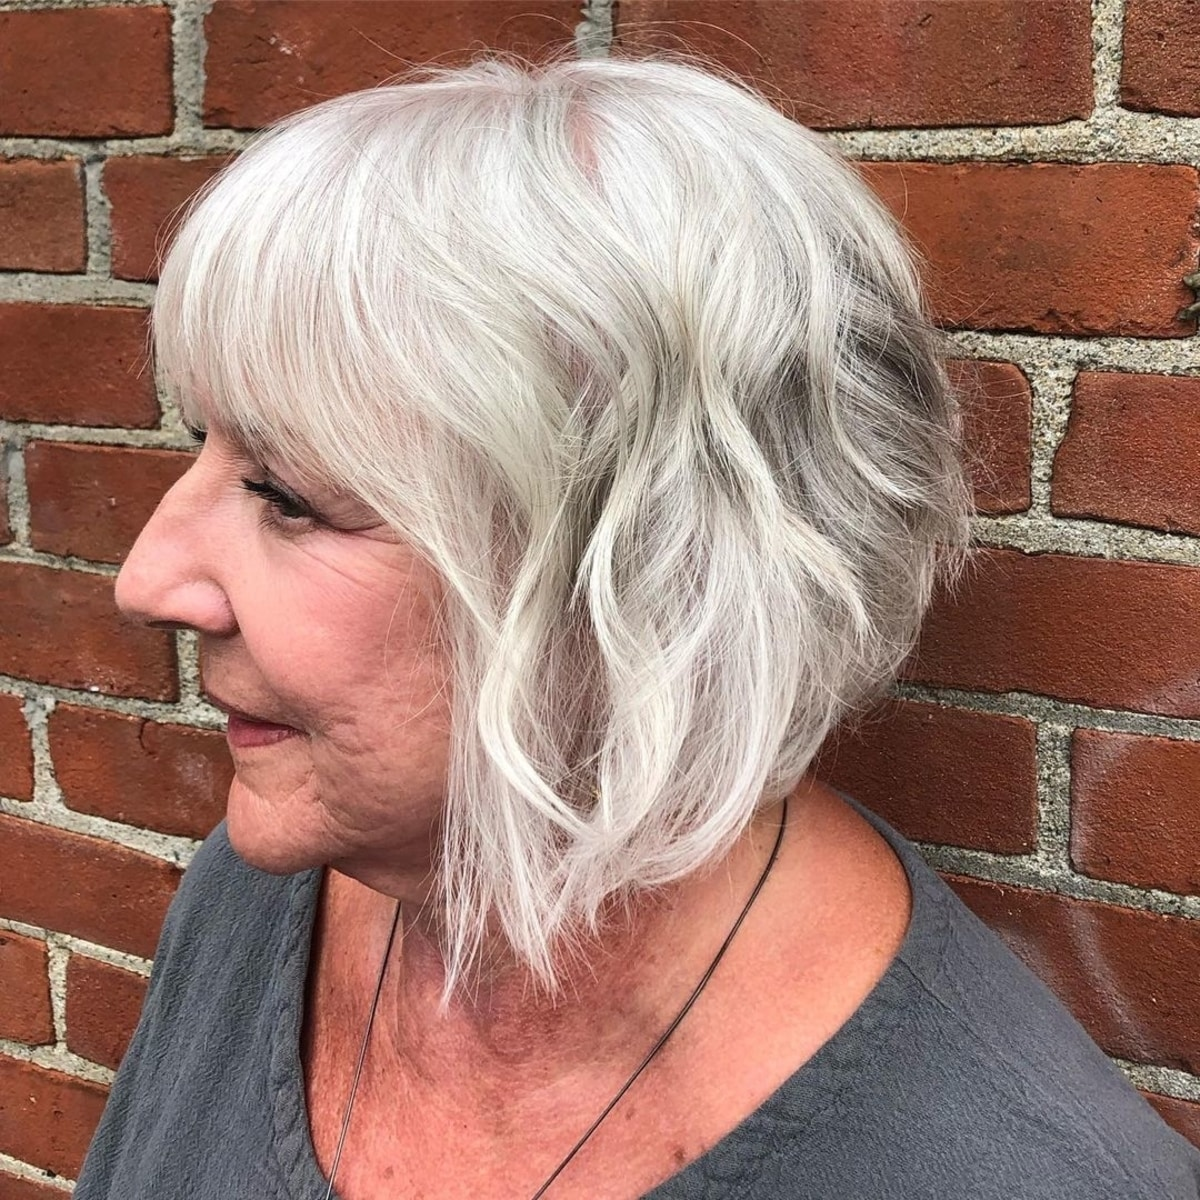 Bob en ángulo favorecedor para cabello gris con flequillo completo